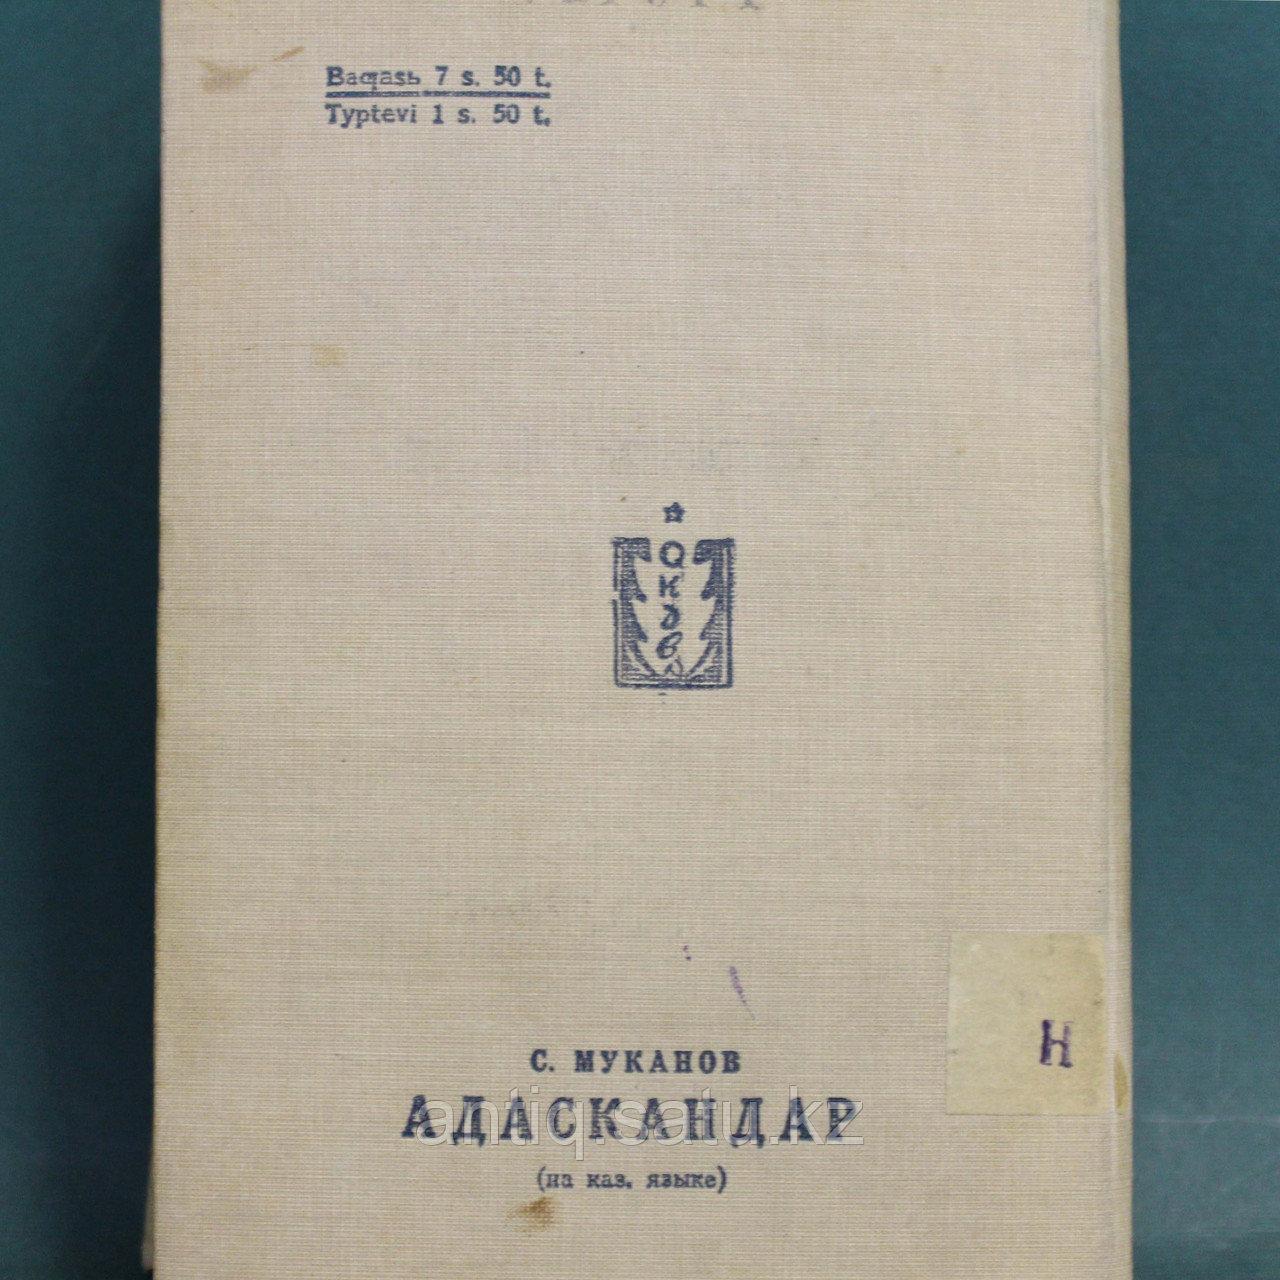 РОМАН «АДАСКАНДАР» Автор - Сабит Муканов (1900-1973). - фото 5